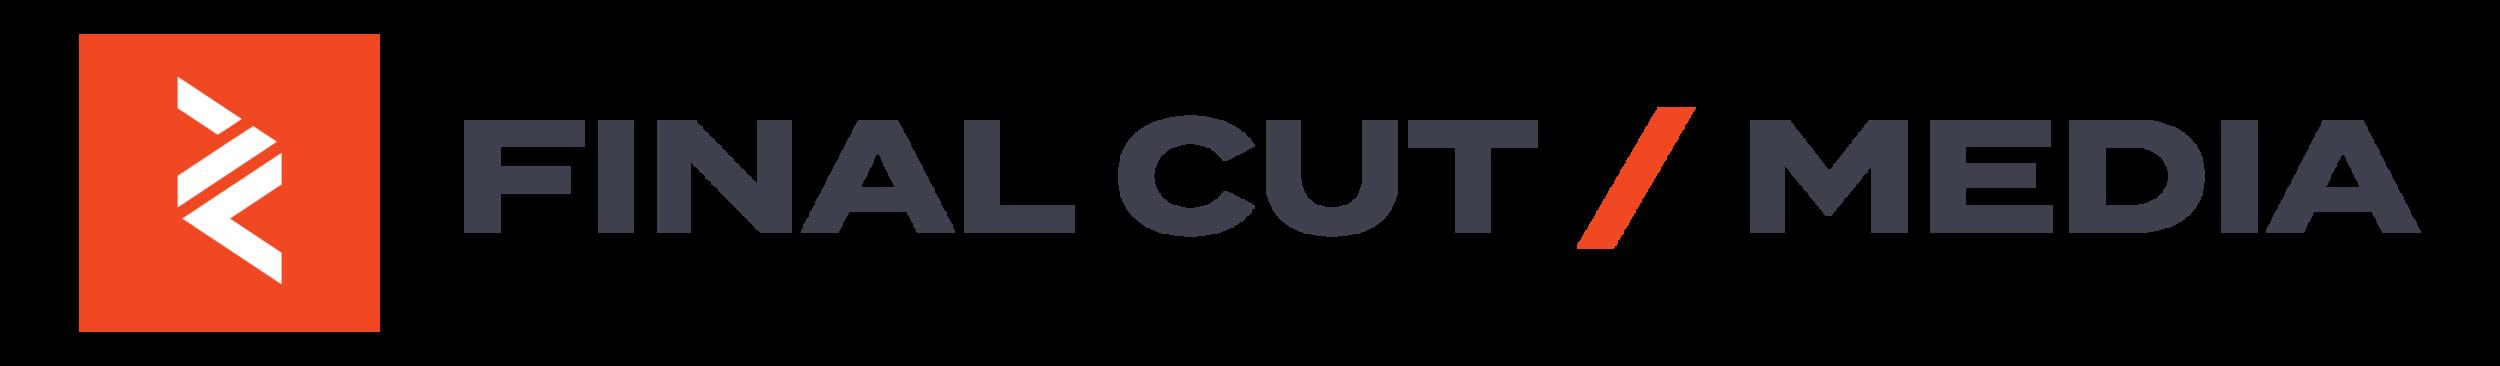 Final Cut Media